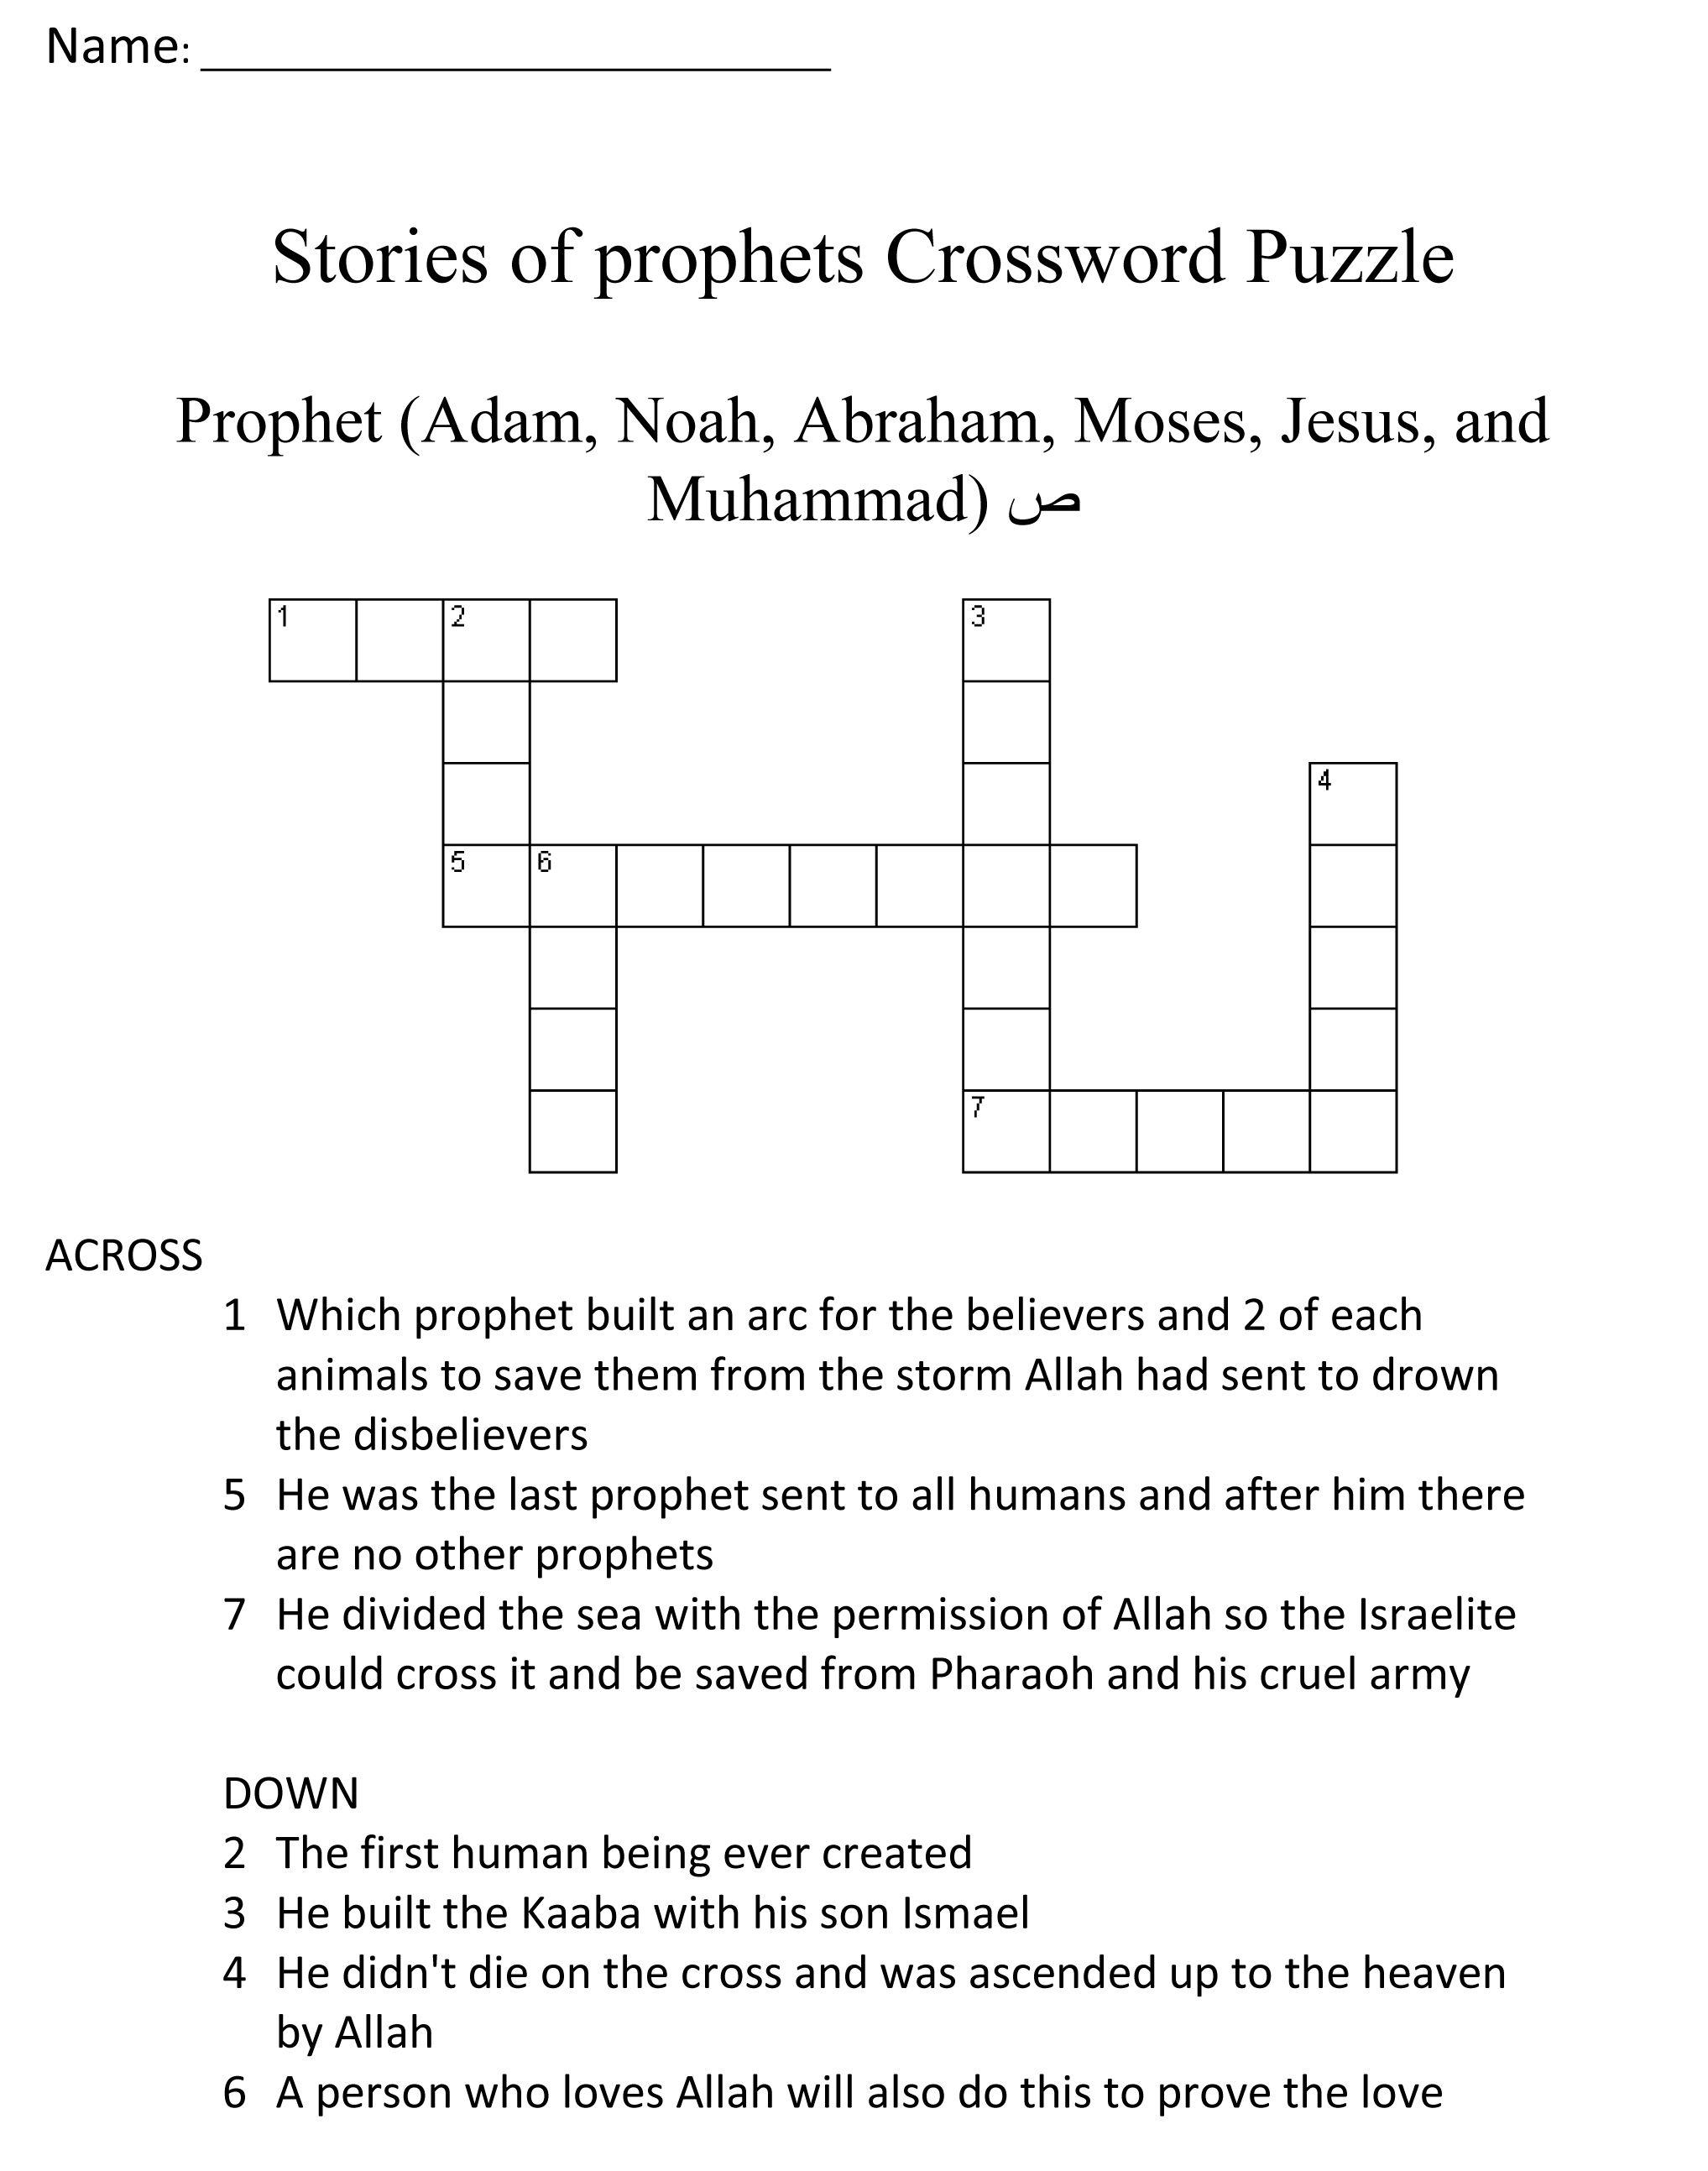 Prophets Crossword Puzzle